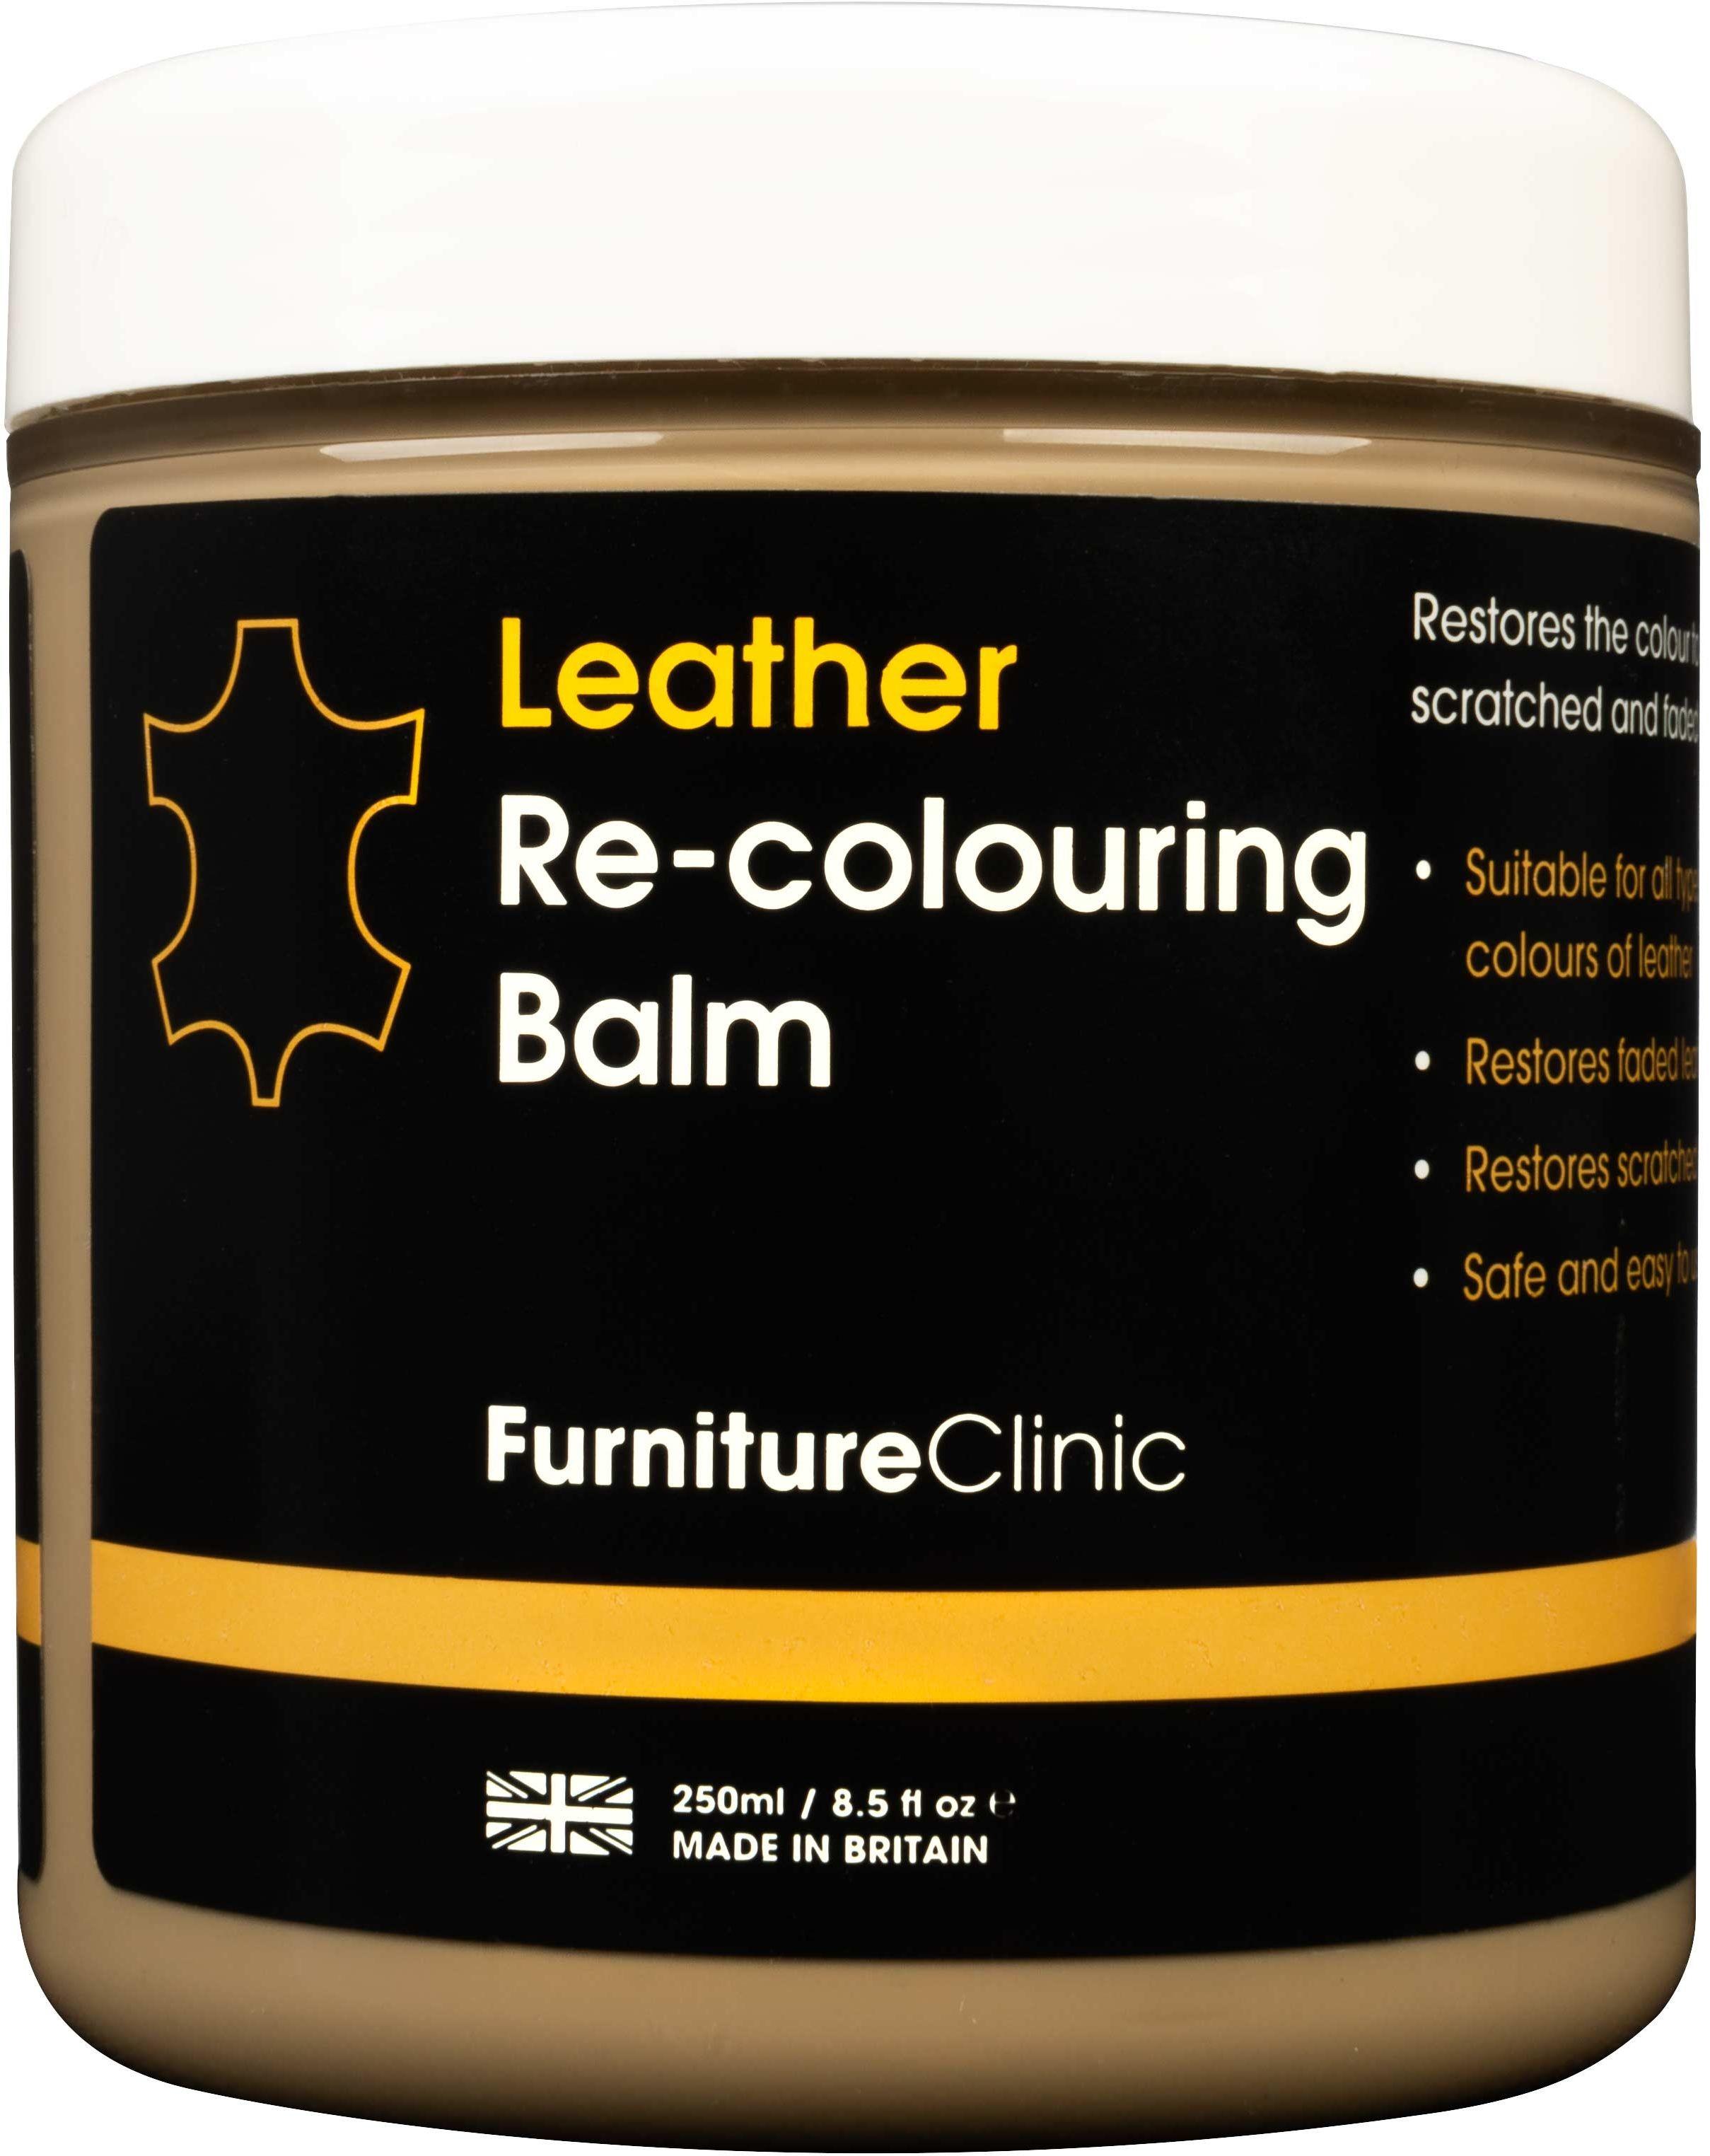 Furniture Clinic Leather Re-Colouring Balm balsam koloryzujący BEIGE 250ml FUR000013